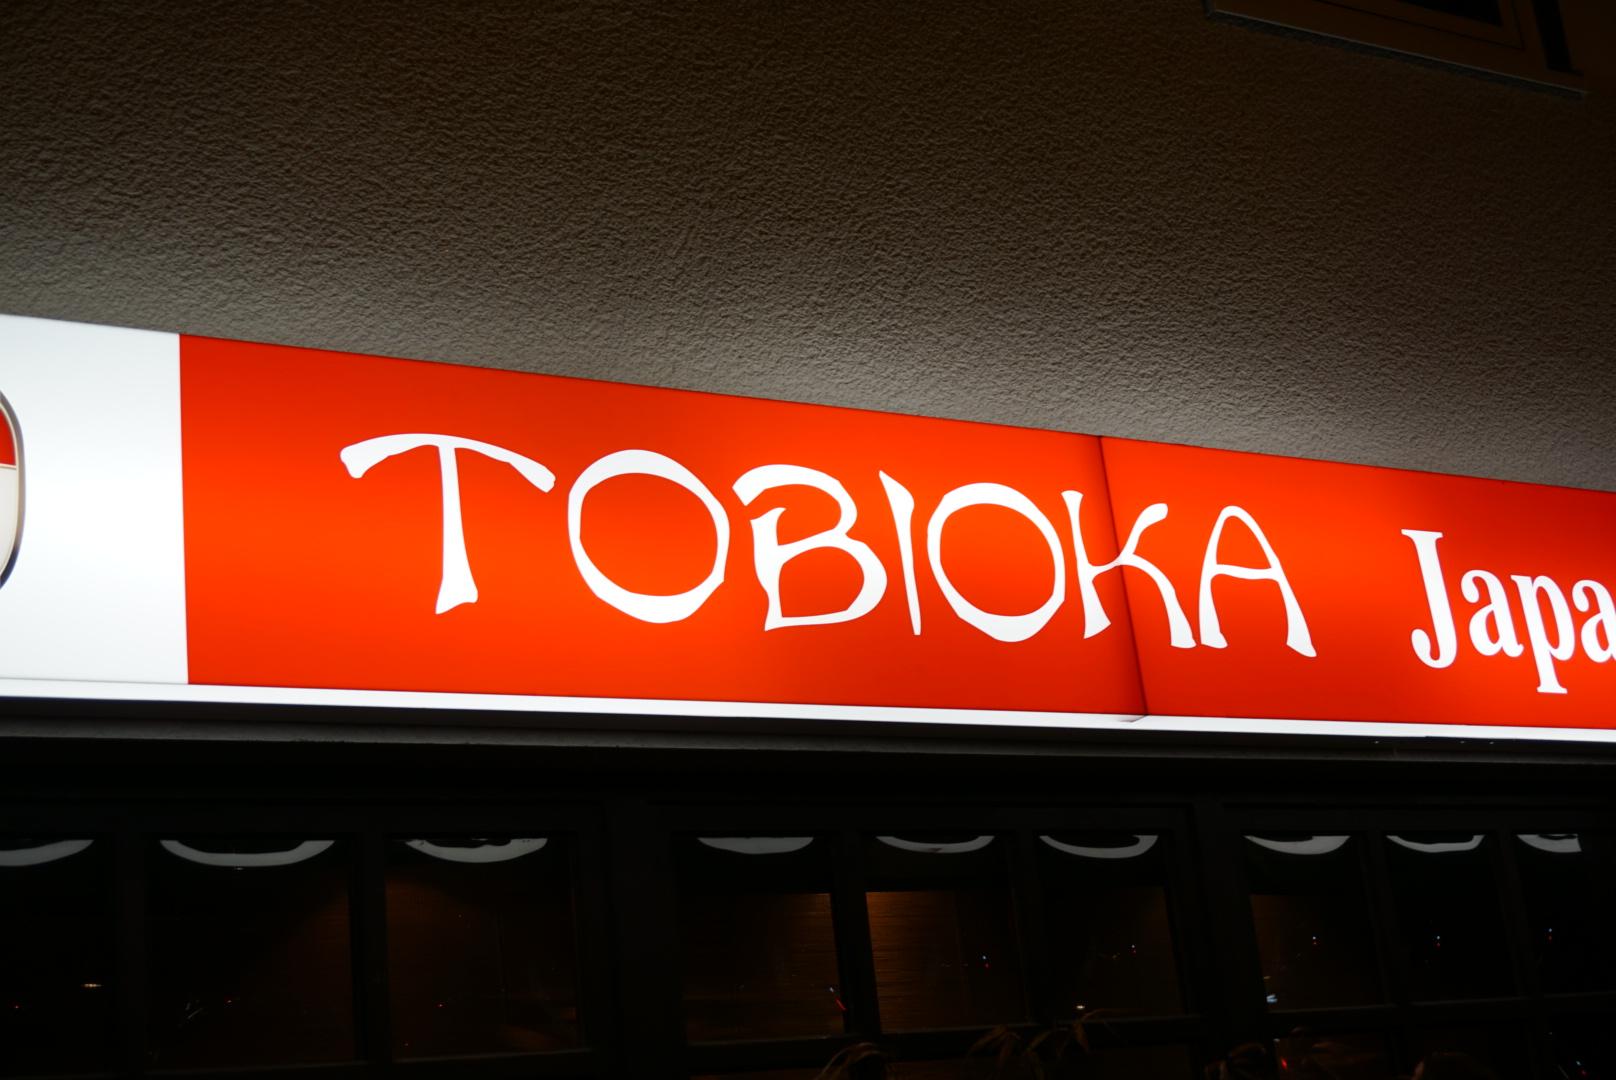 Tobioka